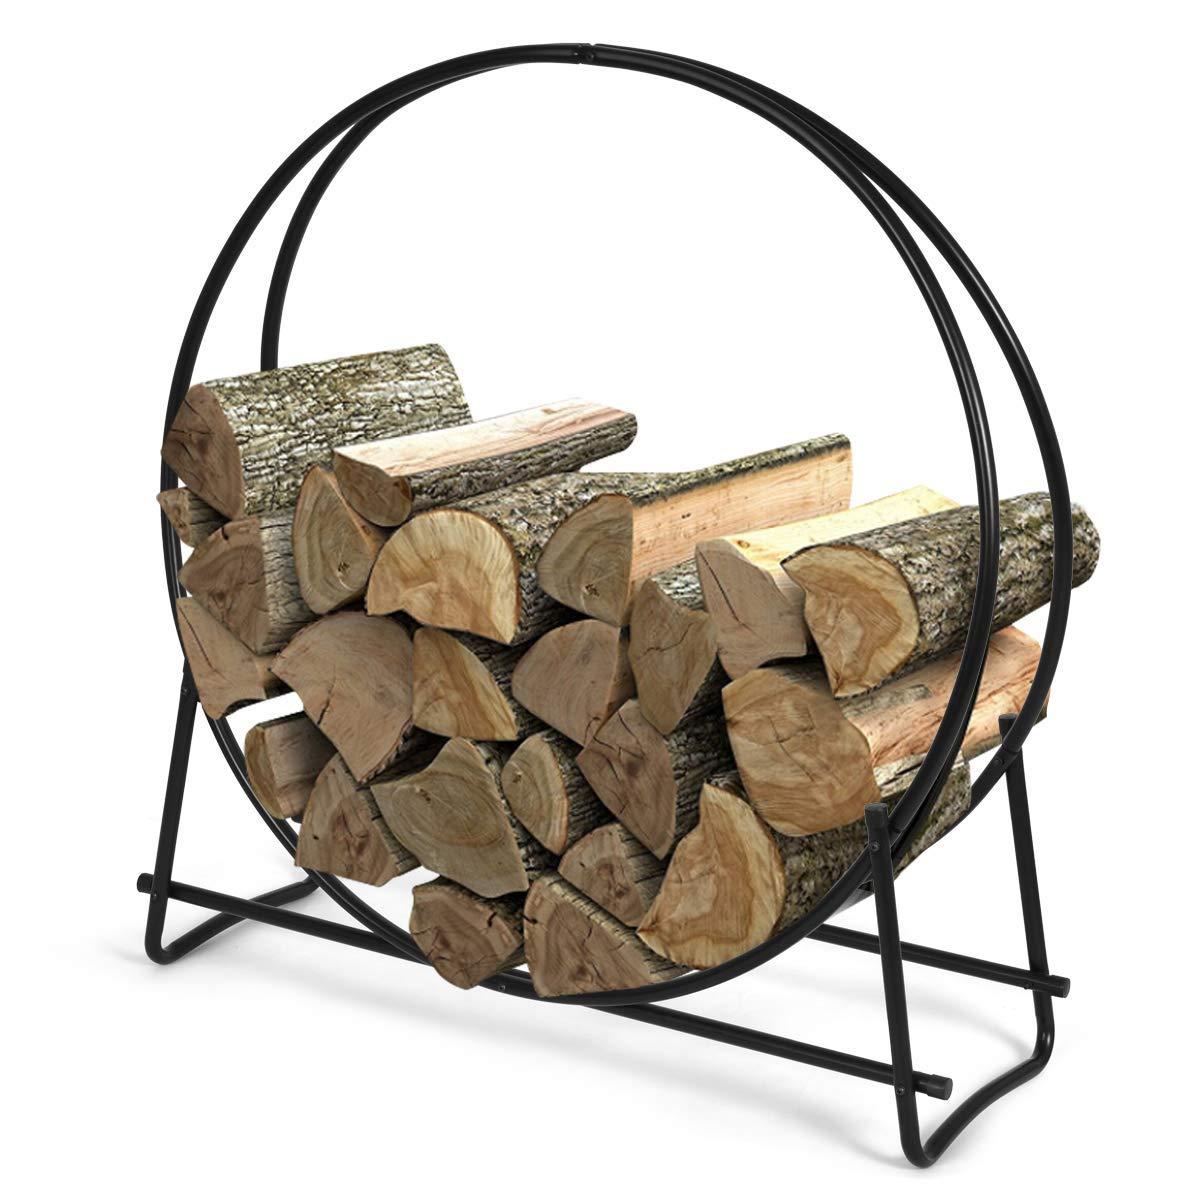 Goplus Firewood Log Hoop, Tubular Steel Wood Storage Rack Holder for Indoor & Outdoor Fireplace Pit (41 inch) by Goplus